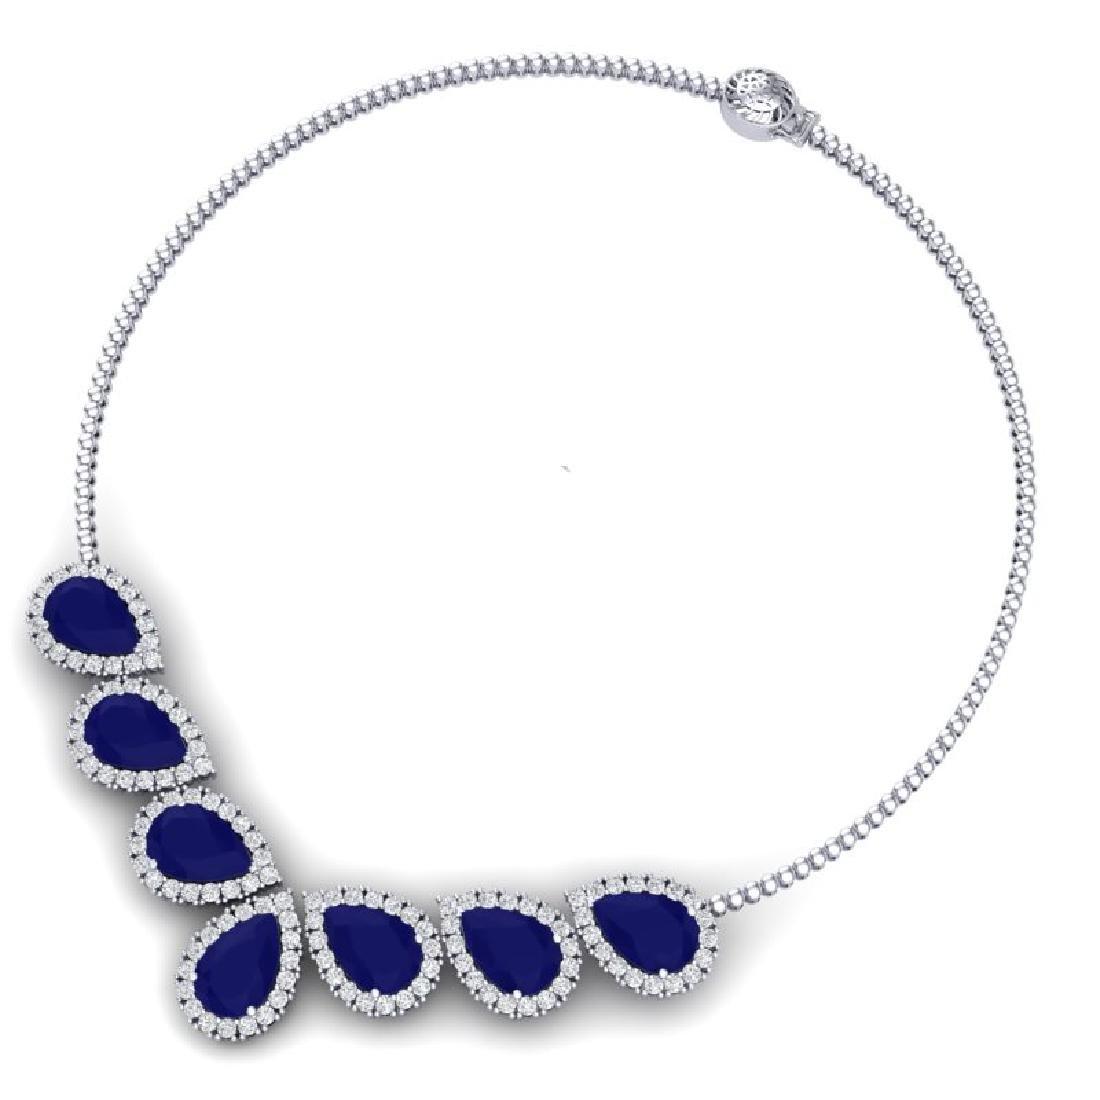 34.72 CTW Royalty Sapphire & VS Diamond Necklace 18K - 3